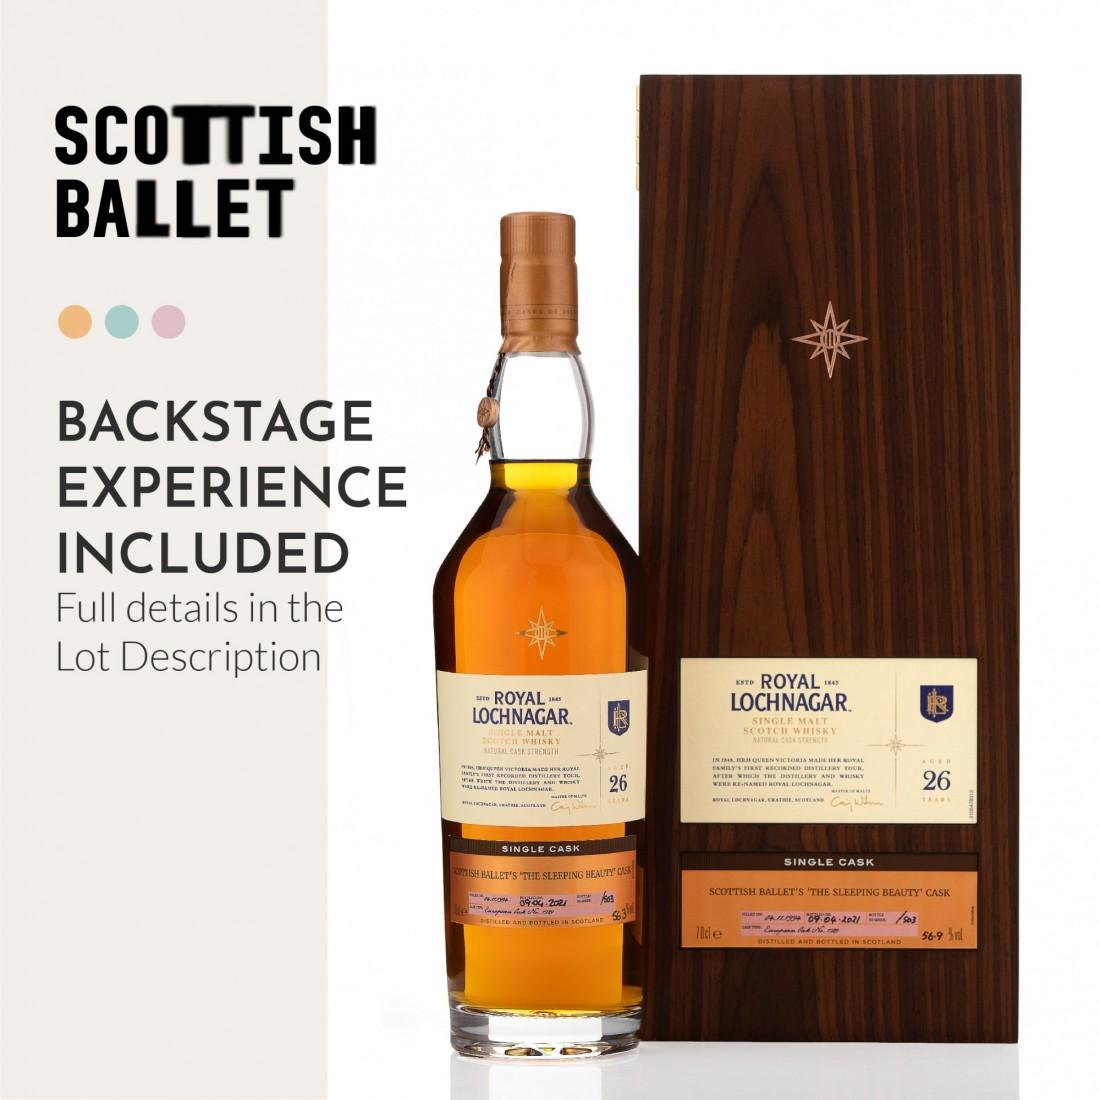 Royal Lochnagar 1994 Casks of Distinction 26 Year Old #1289 / Bottle #002